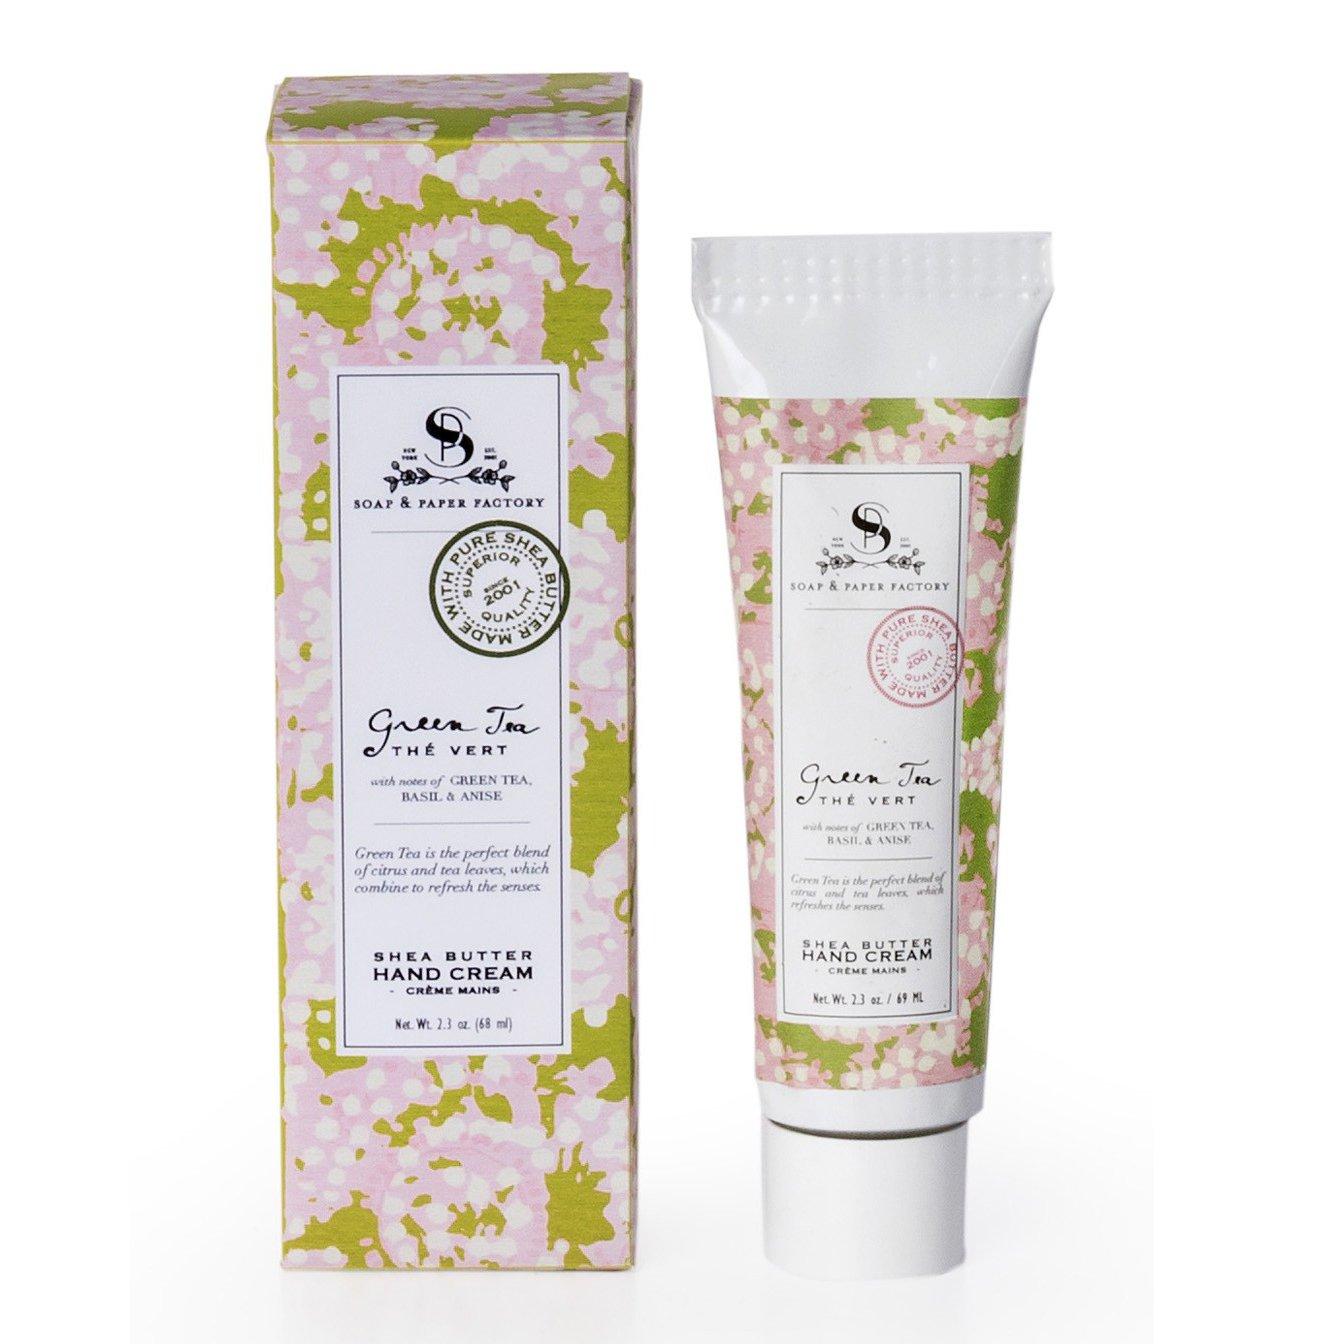 The Soap & Paper Factory Green Tea Shea Butter Hand Cream, 2.3 oz